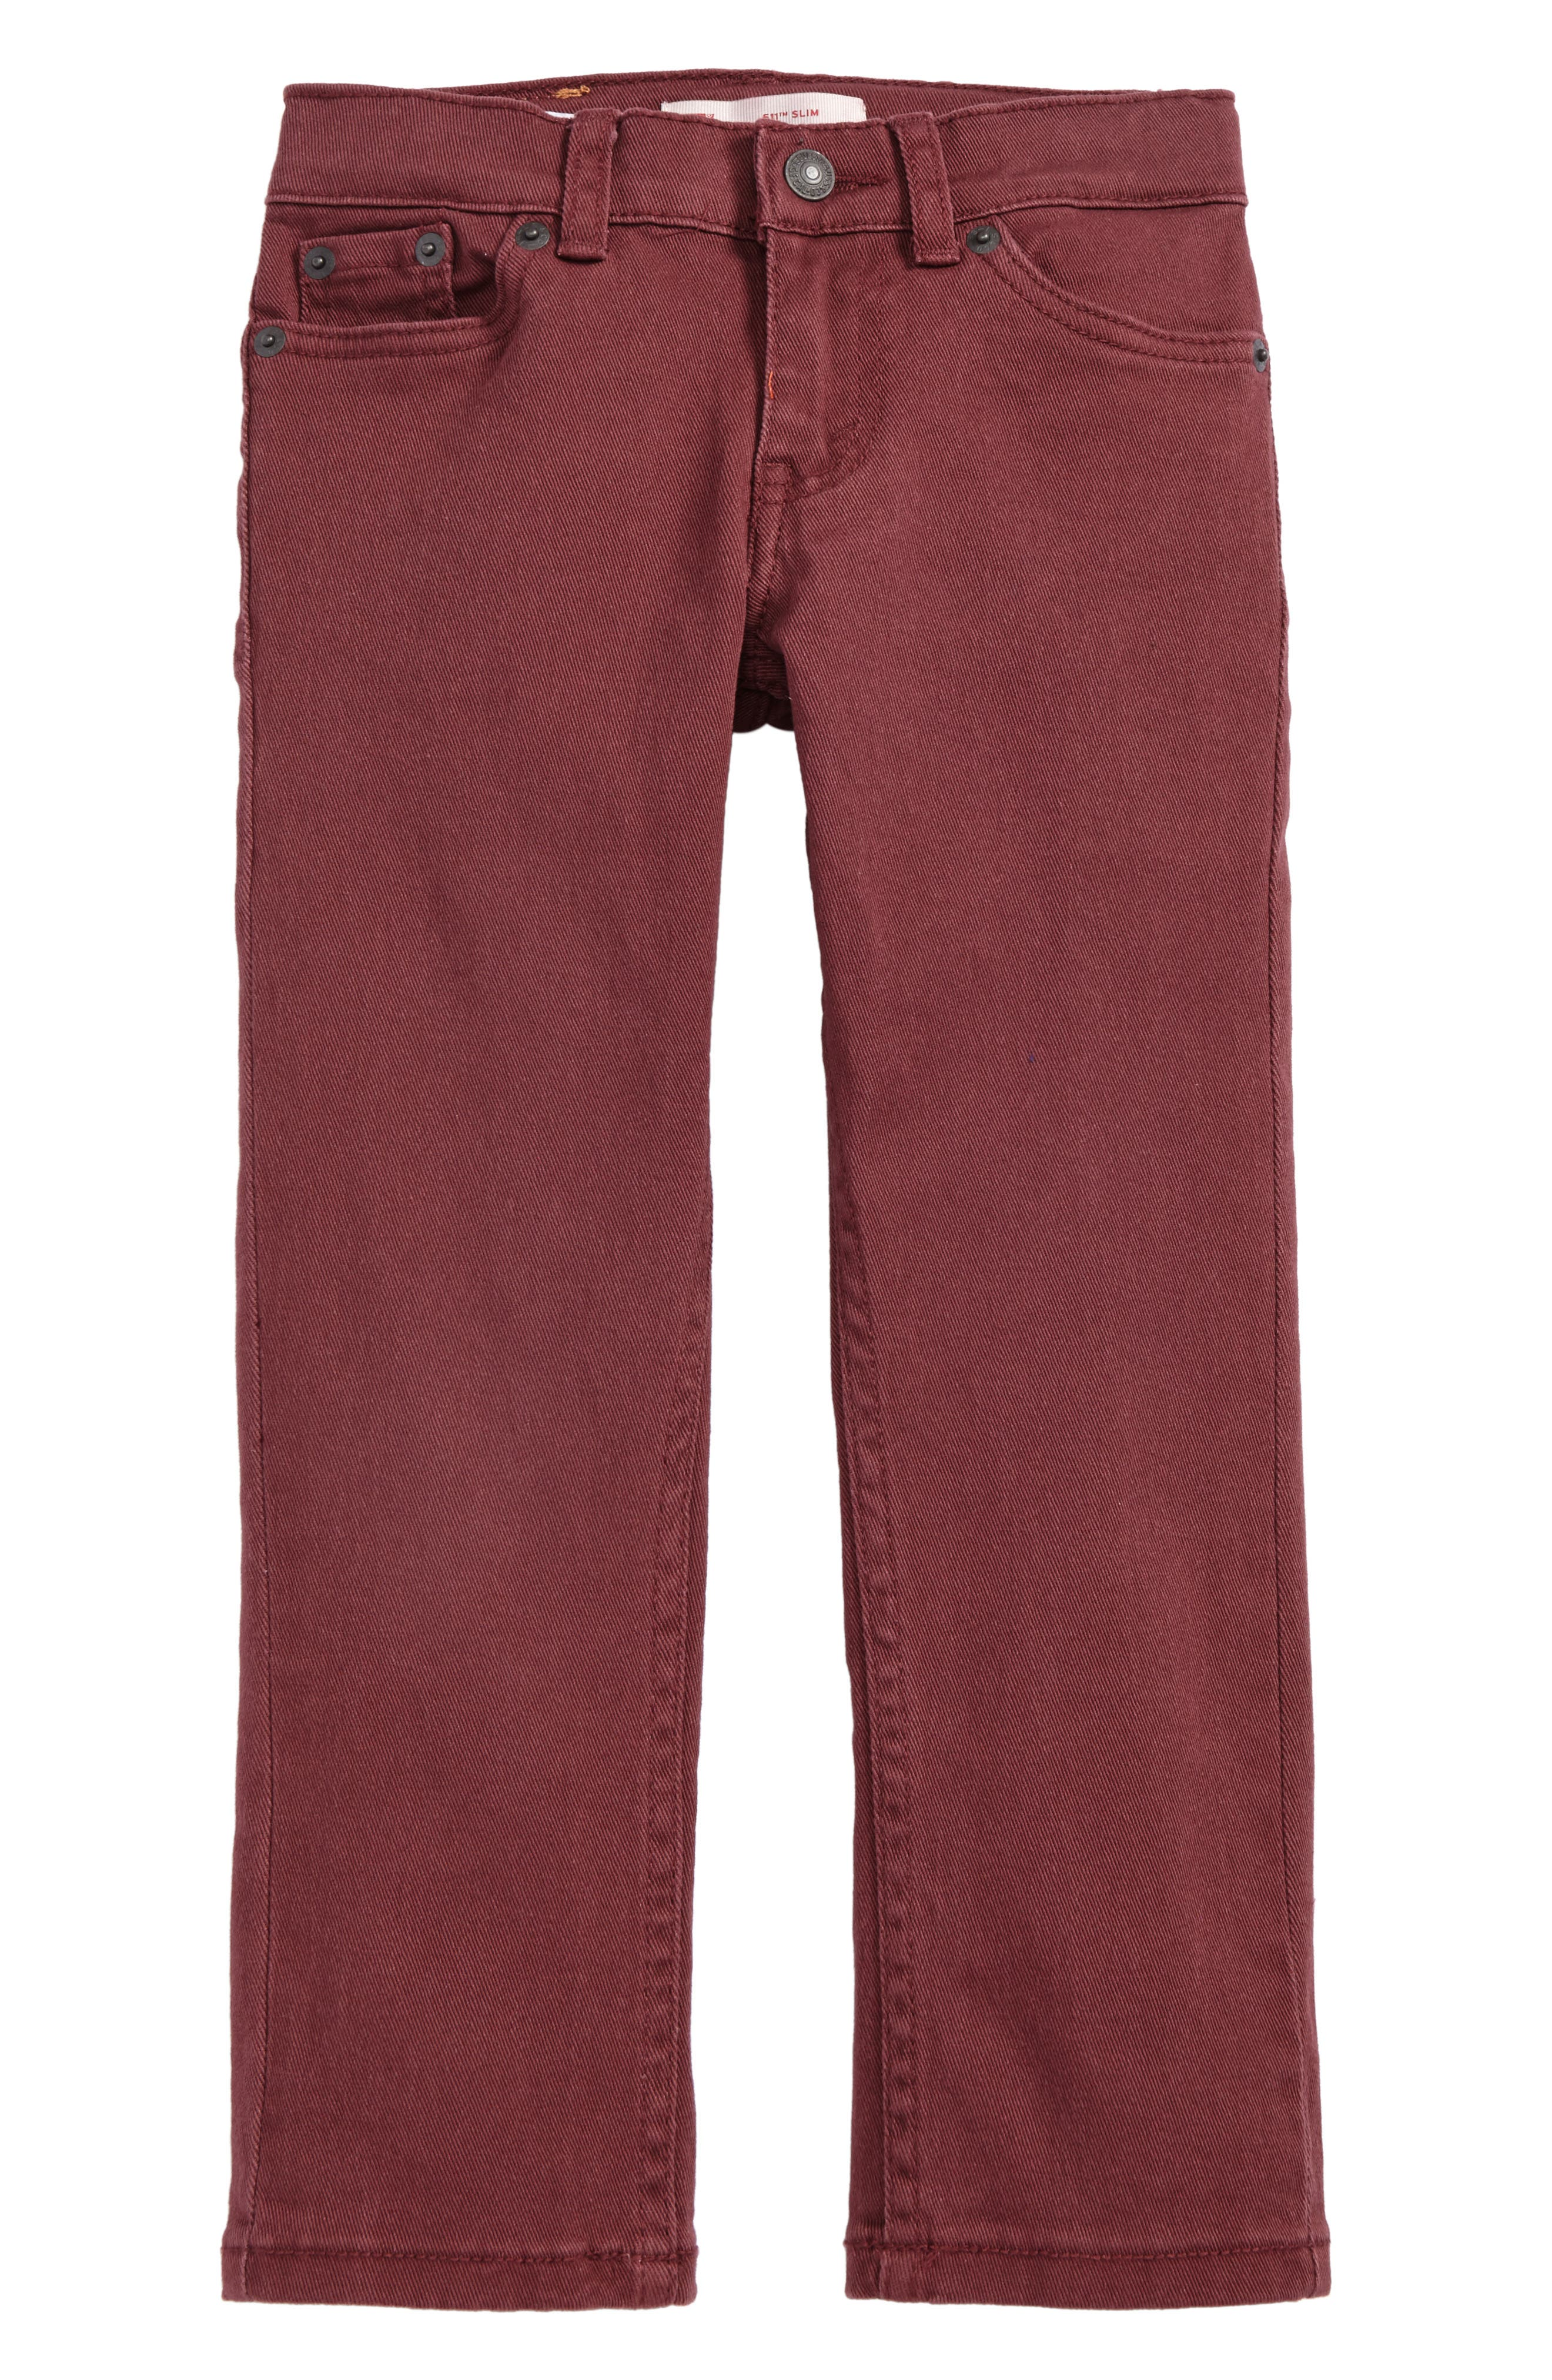 511<sup>™</sup> Slim Fit Jeans,                             Main thumbnail 1, color,                             Red Mahogany